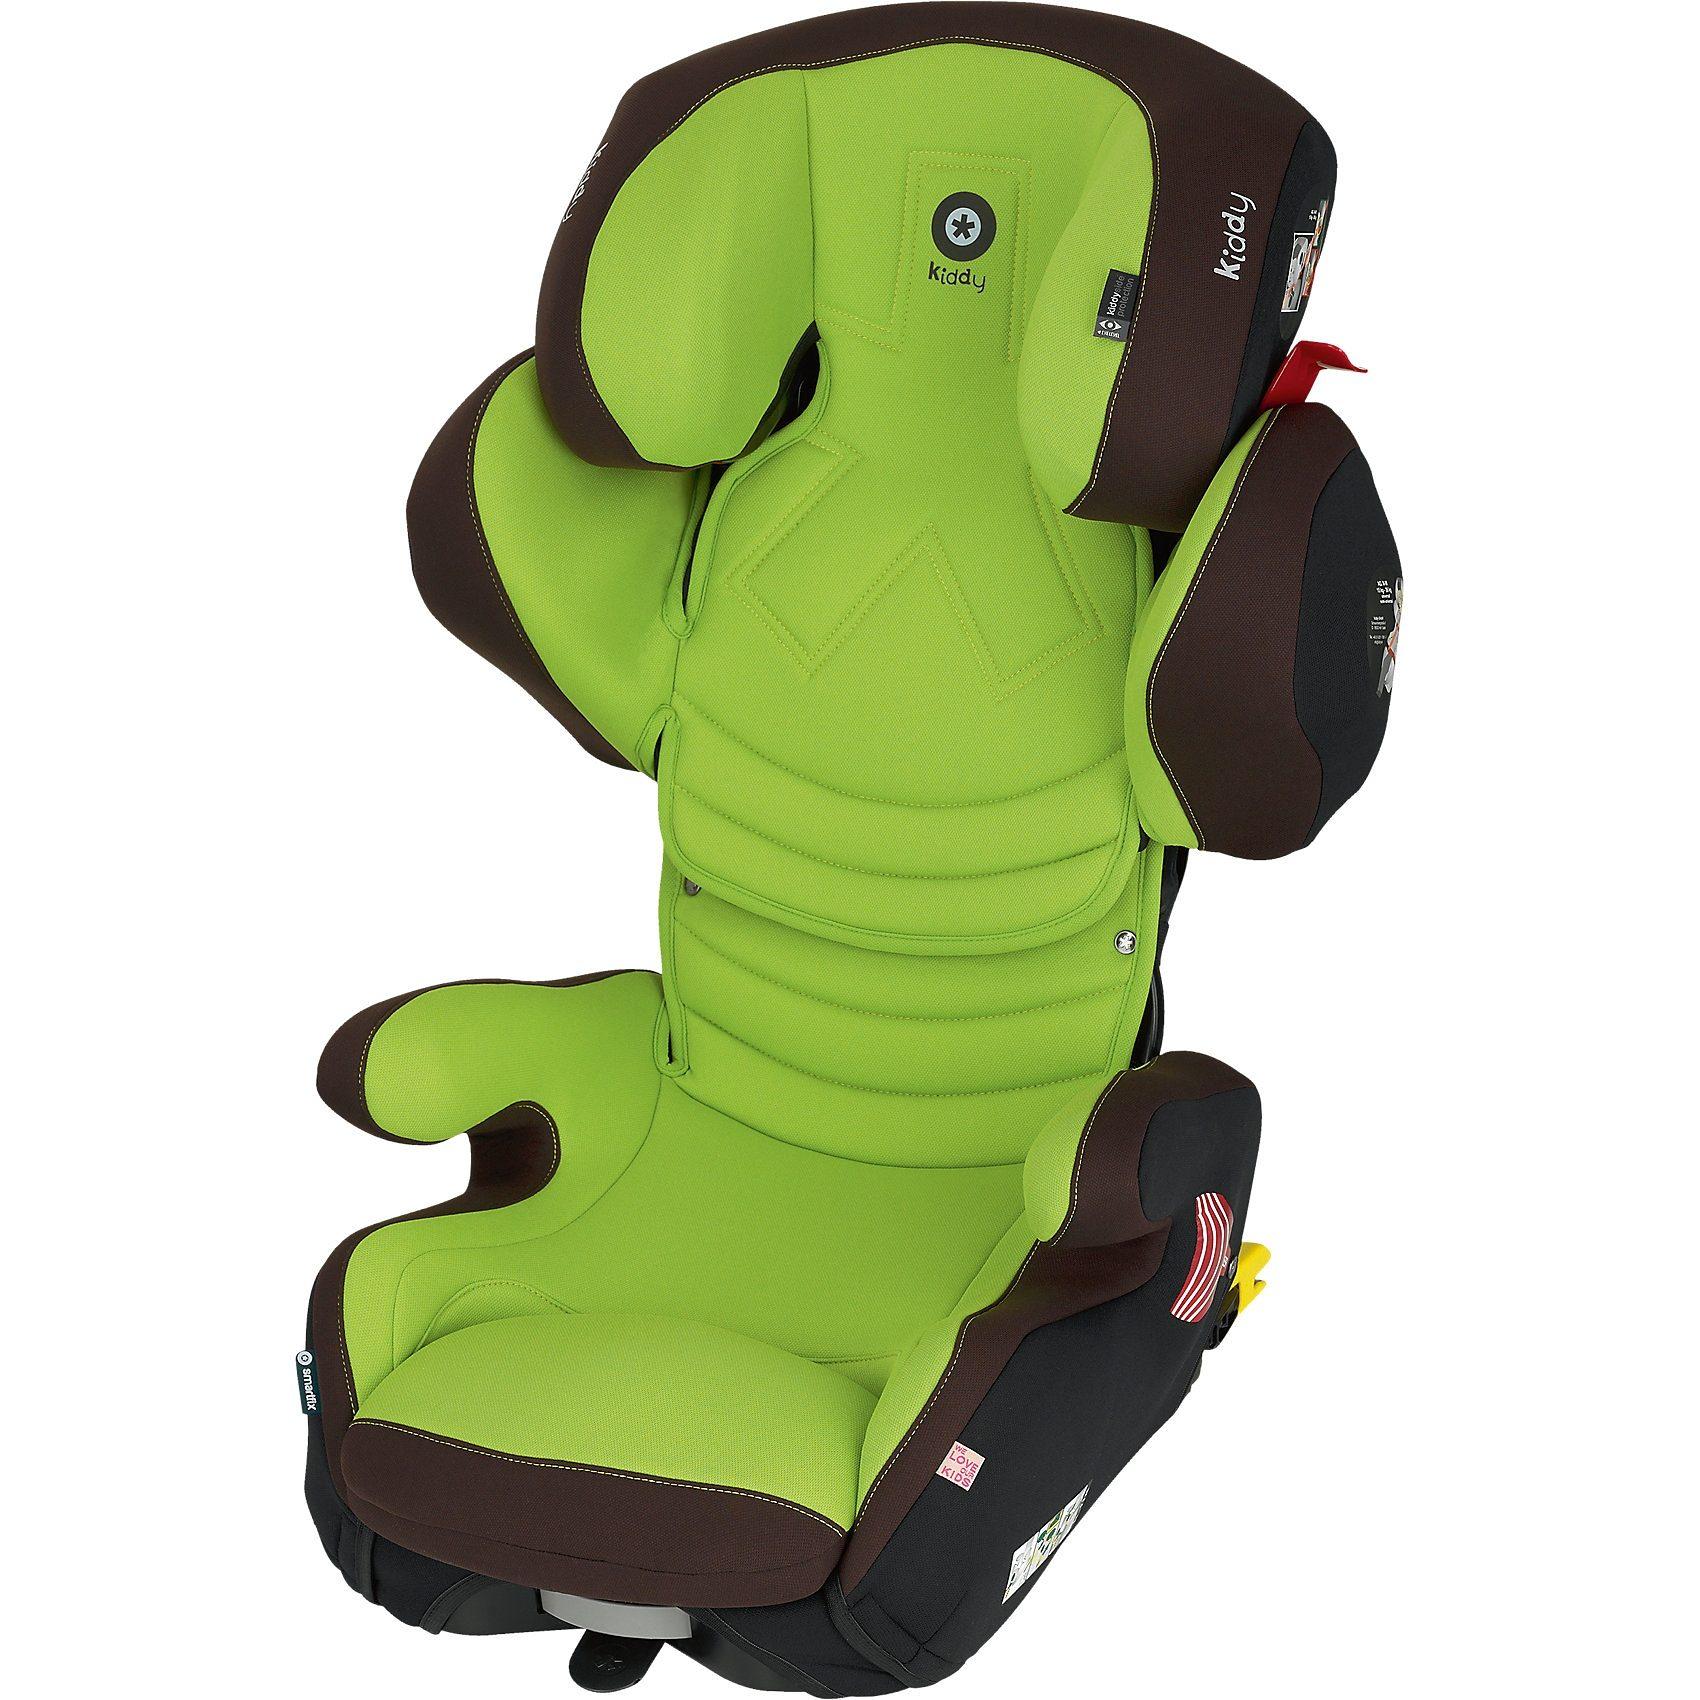 Kiddy Auto-Kindersitz Smartfix, Dublin, 2016